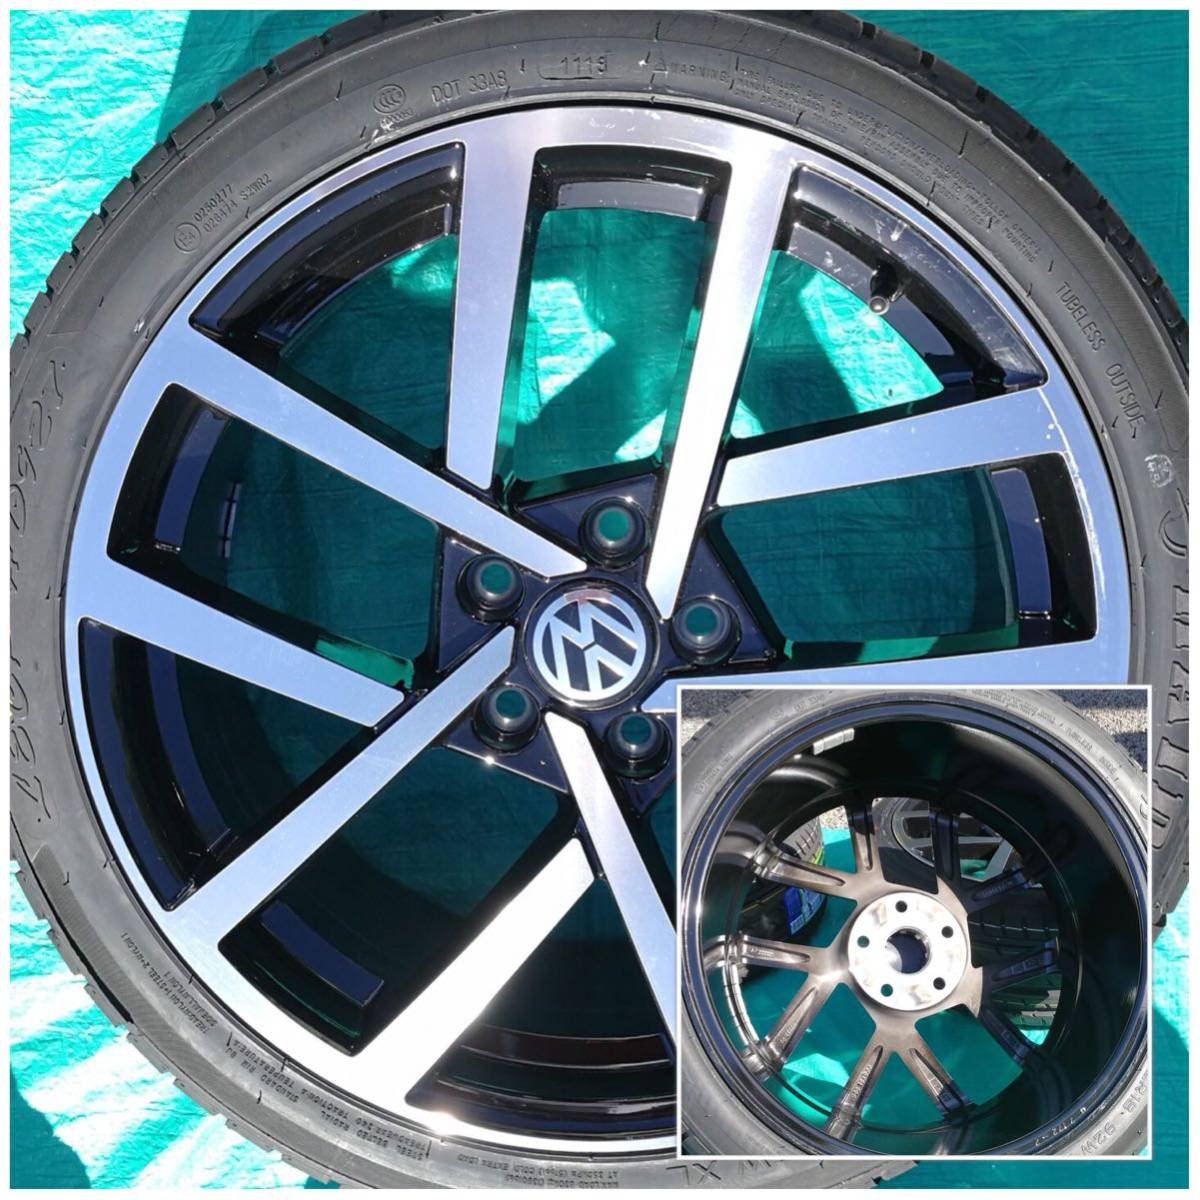 VW ワーゲン ゴルフ5 ゴルフ6 ゴルフ7 18インチ 新品 225/40R18 4本 タイヤセット品_画像6